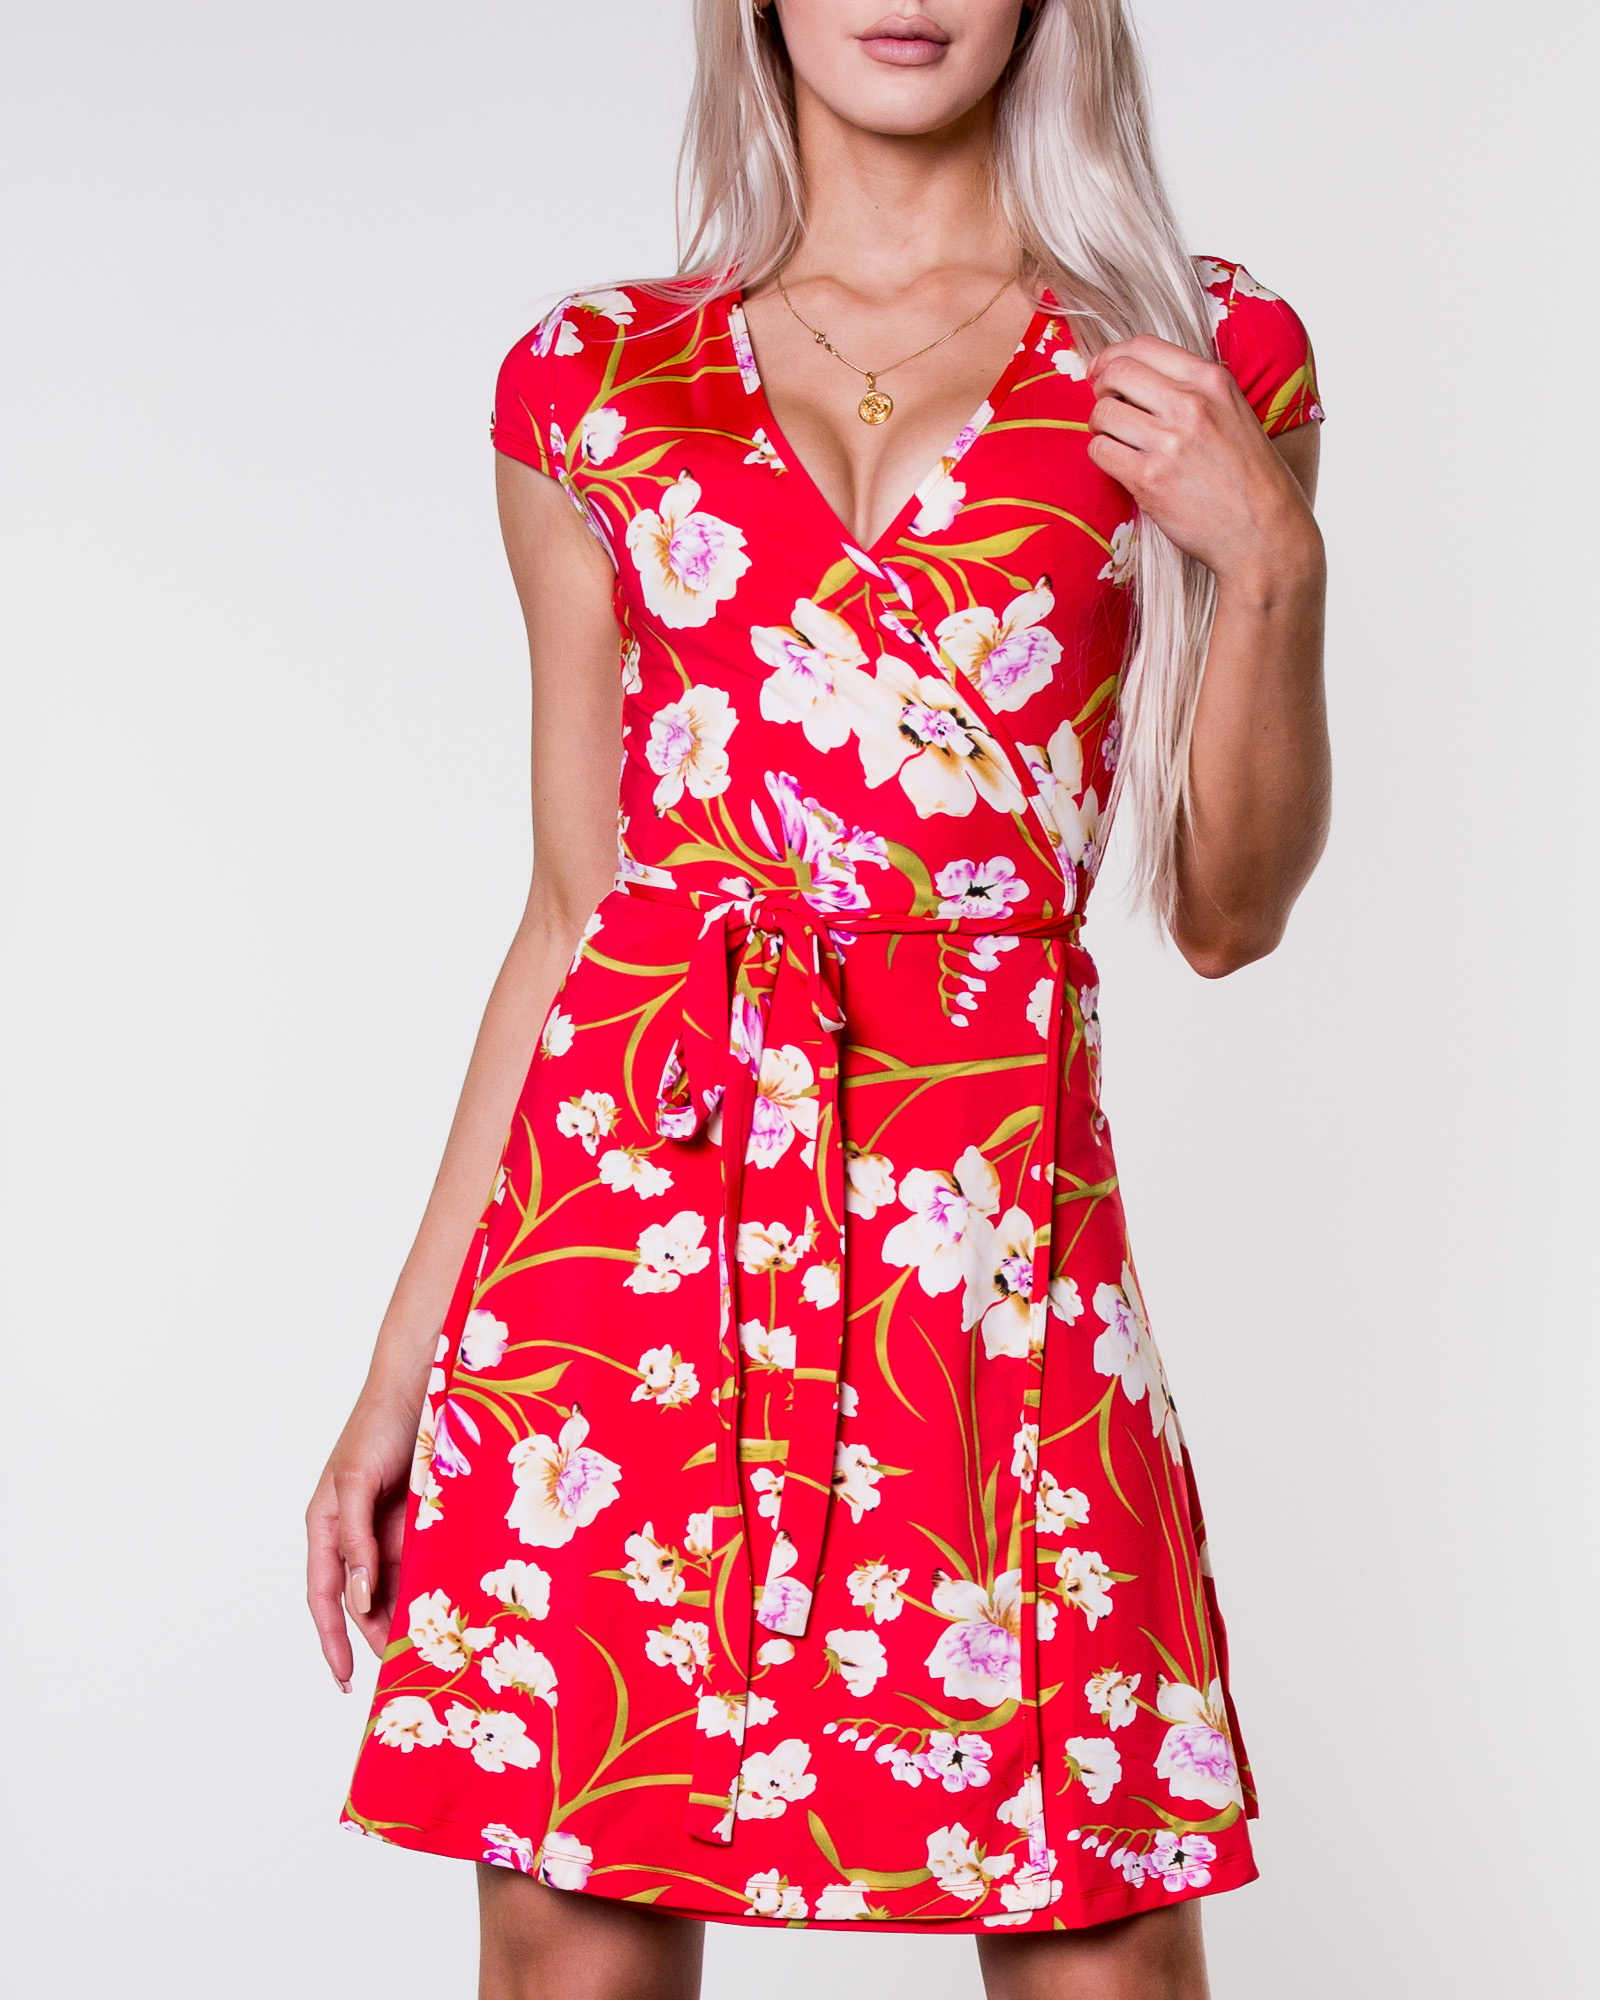 817b84b7 Chiara Forthi, Sonnet Mini Wrap Dress Red/Floral   Women's Dresses    HOUSEOFBRANDON.COM